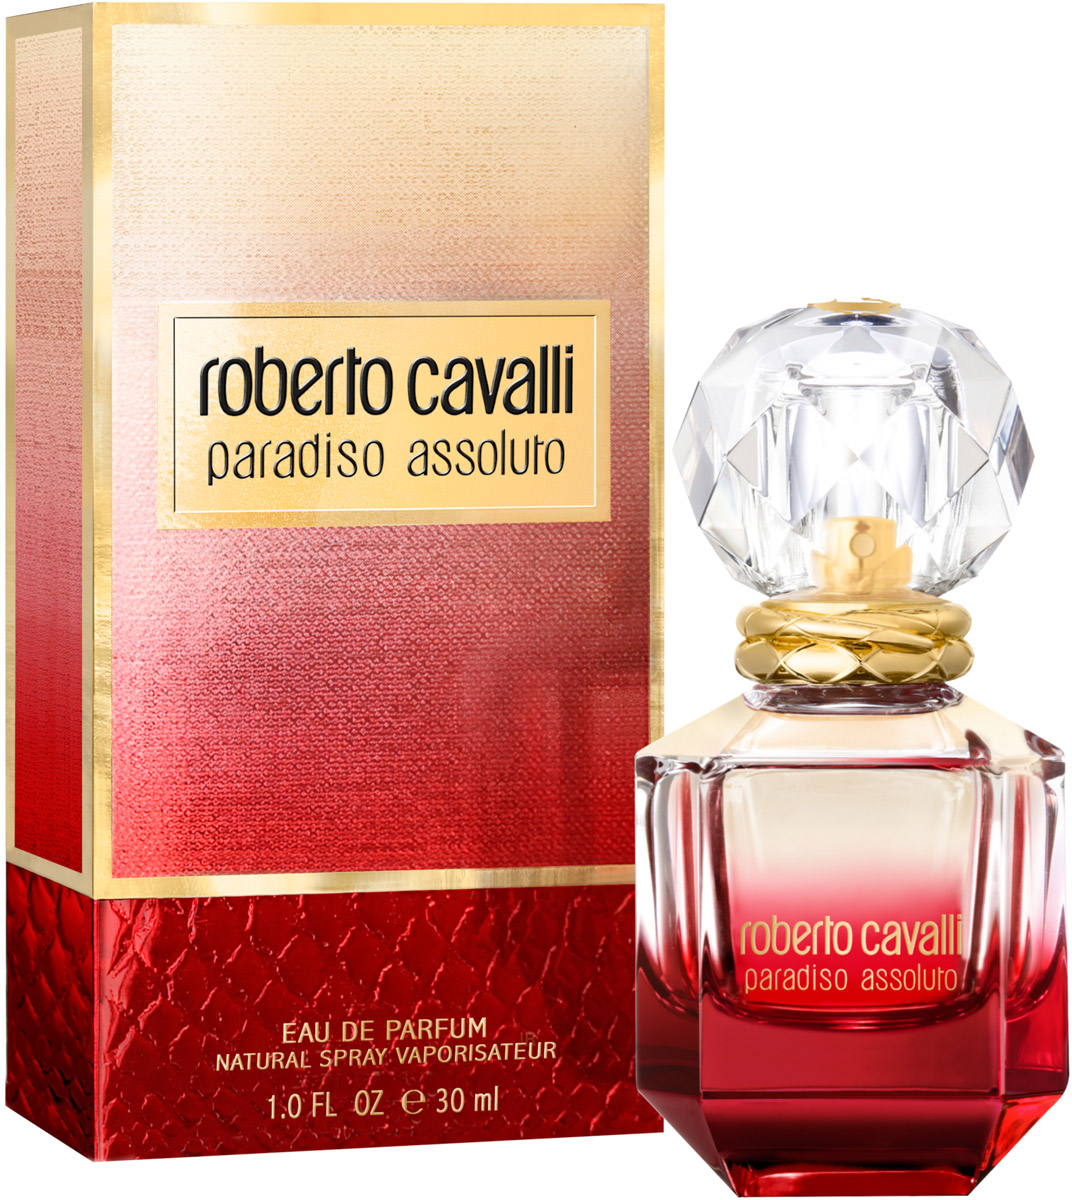 Roberto Cavalli Paradiso Assoluto женская Парфюмерная вода 30 мл